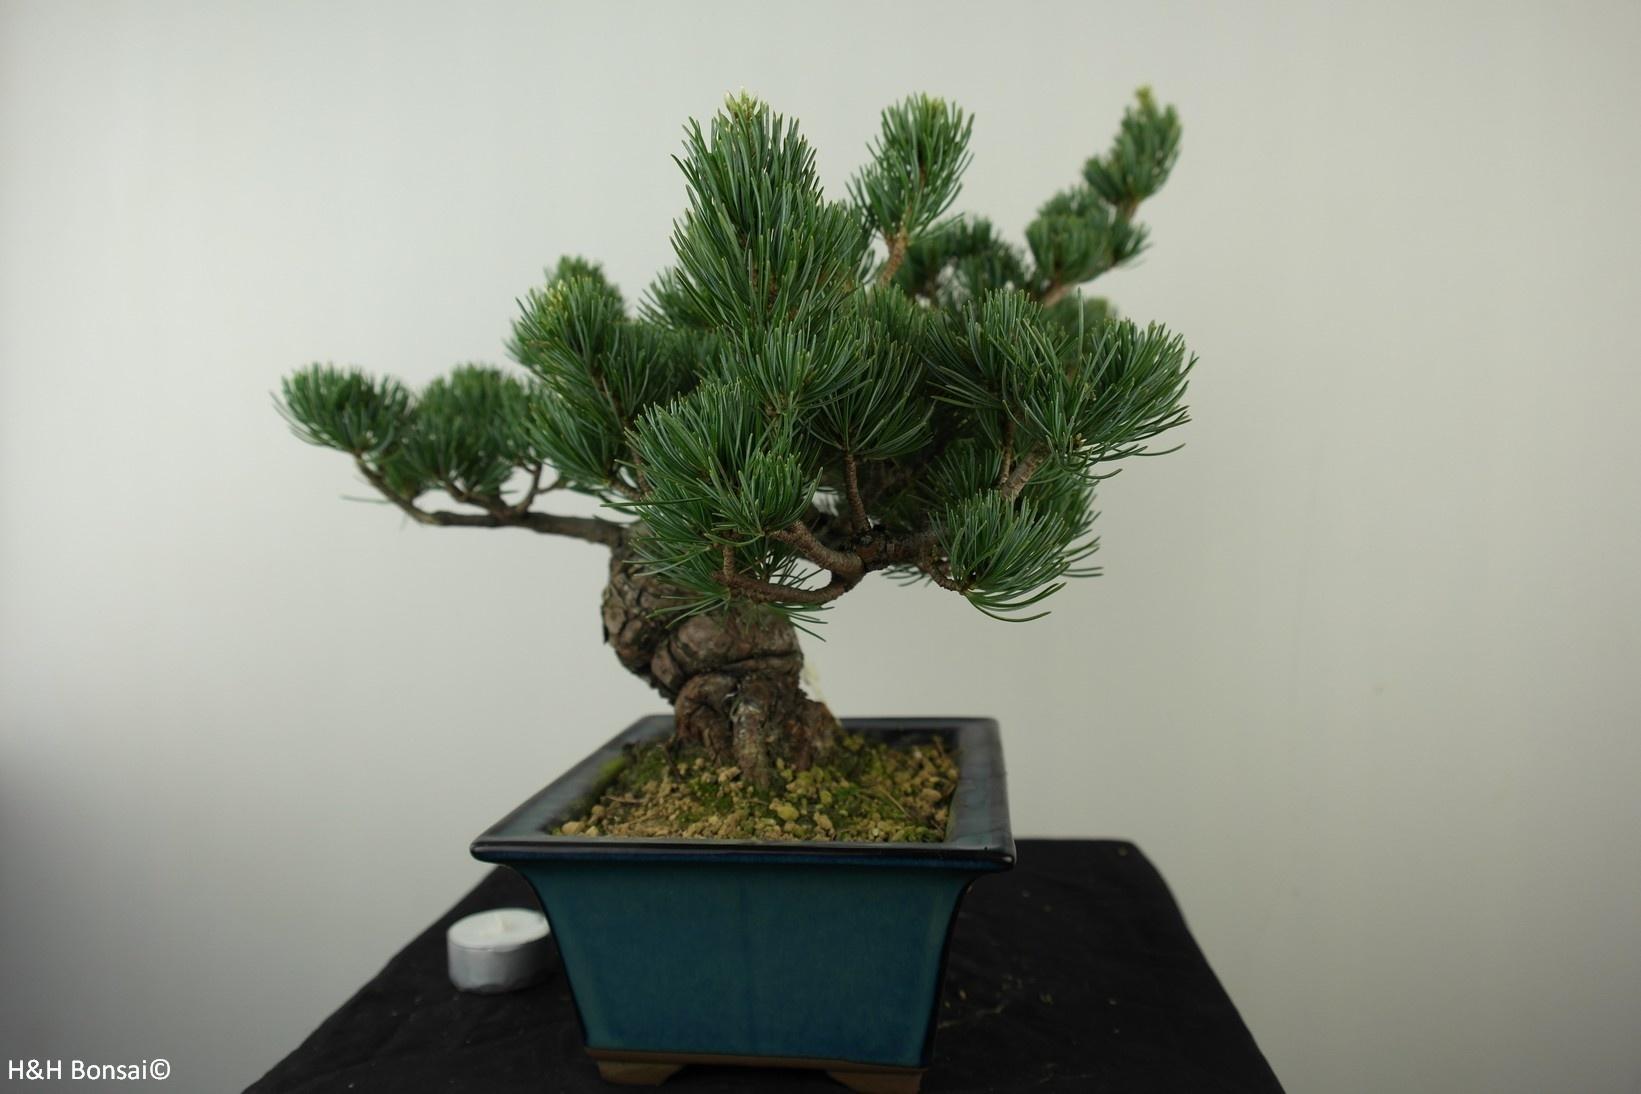 Bonsai Pino bianco, Pinus pentaphylla, no. 7807